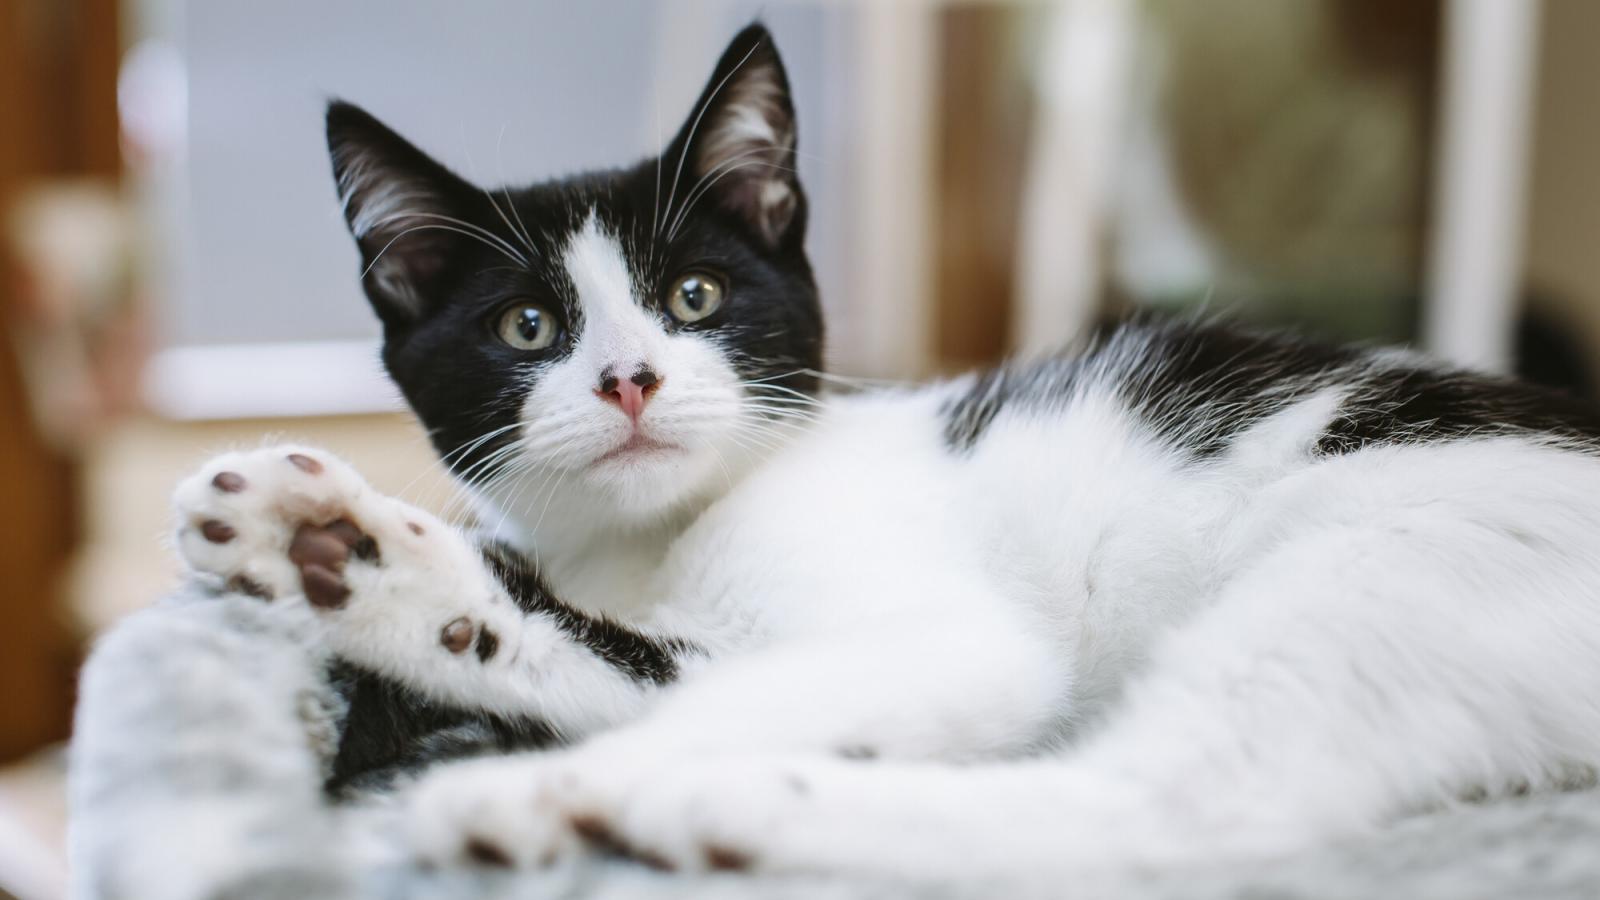 Kitten found abandoned in laundry basket